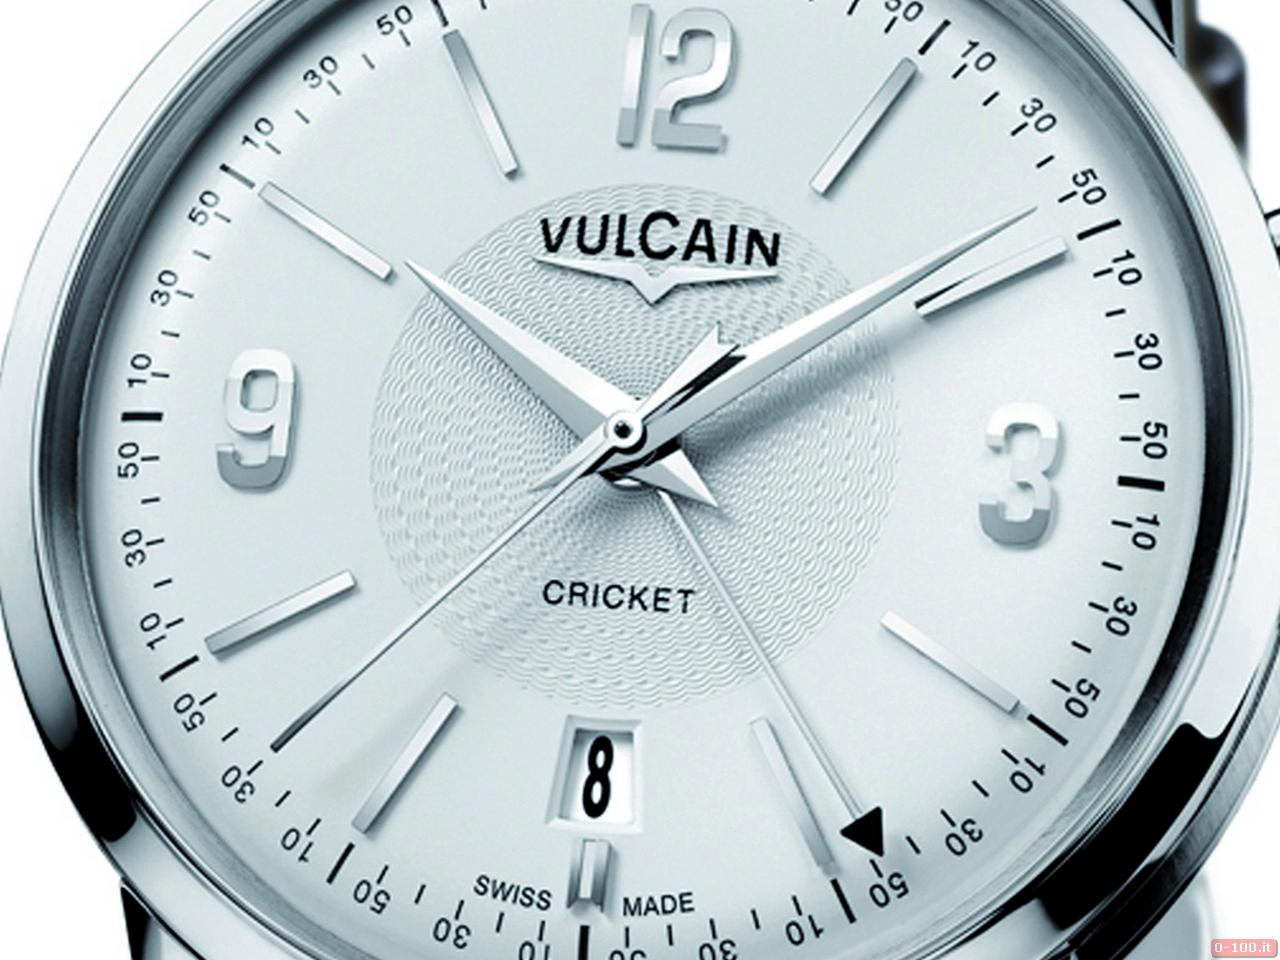 anteprima-baselword-2013-vulcain-50s-presidents-watch_0-100_2